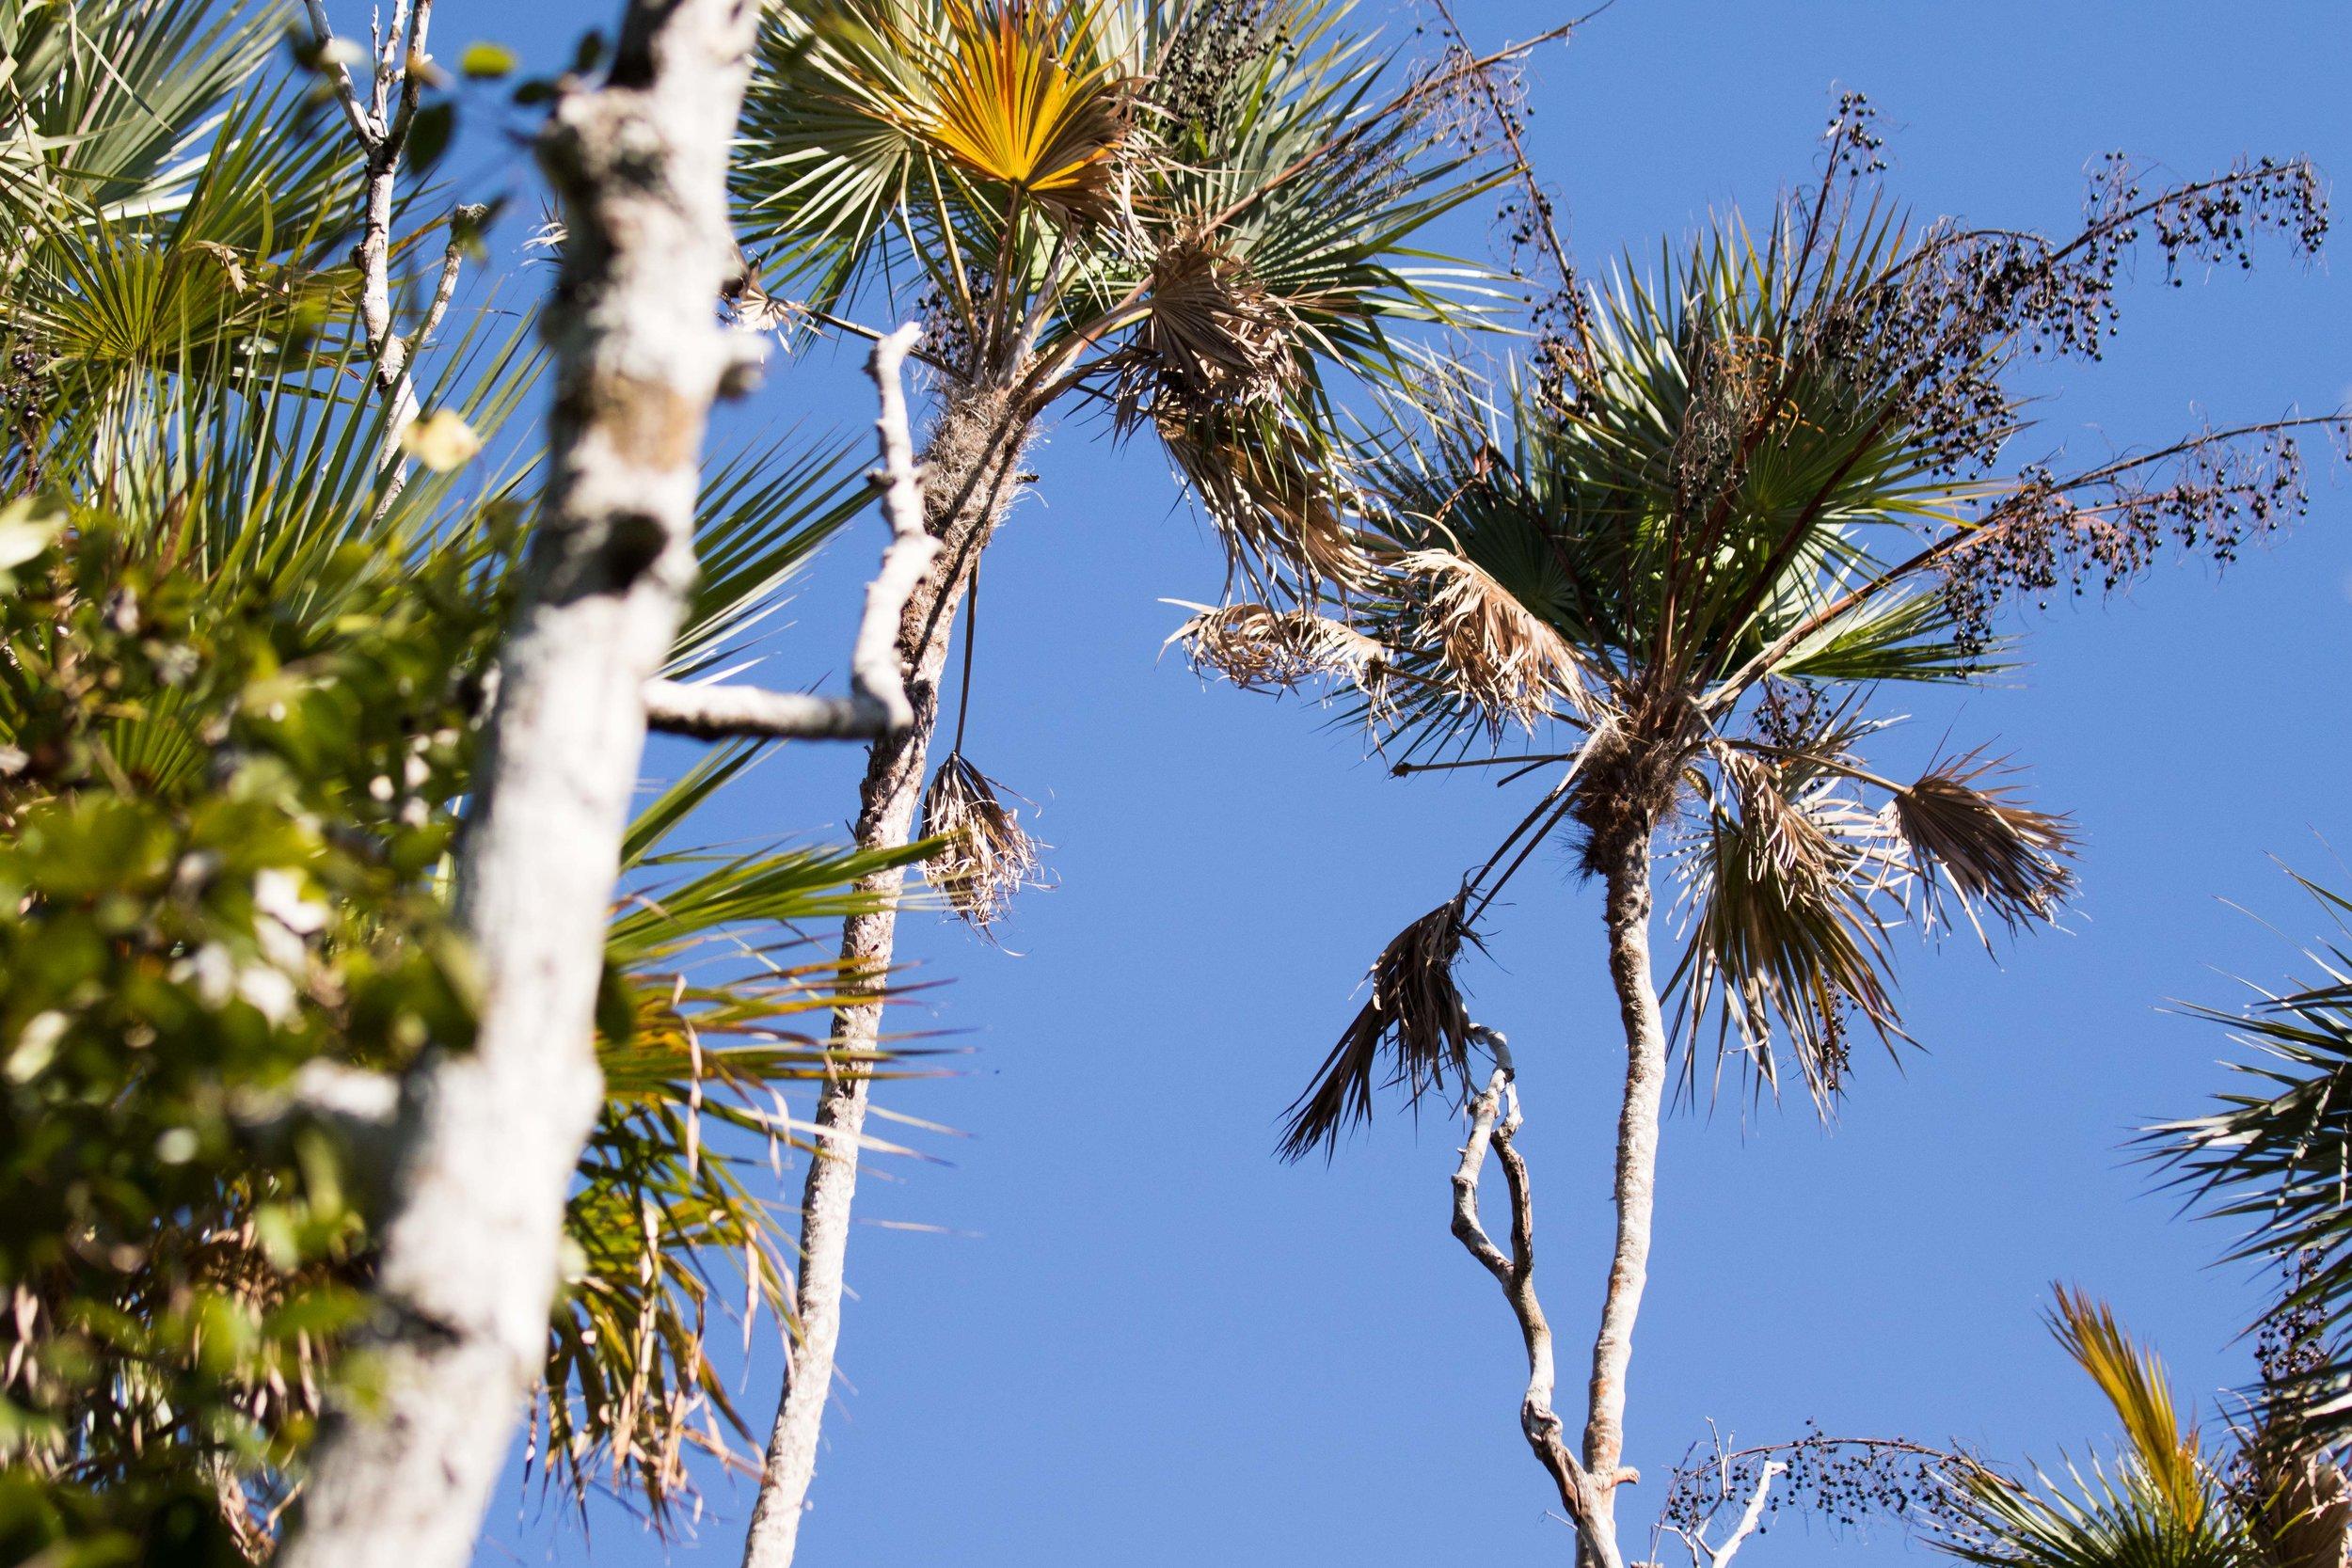 2019_Everglades-167.jpg